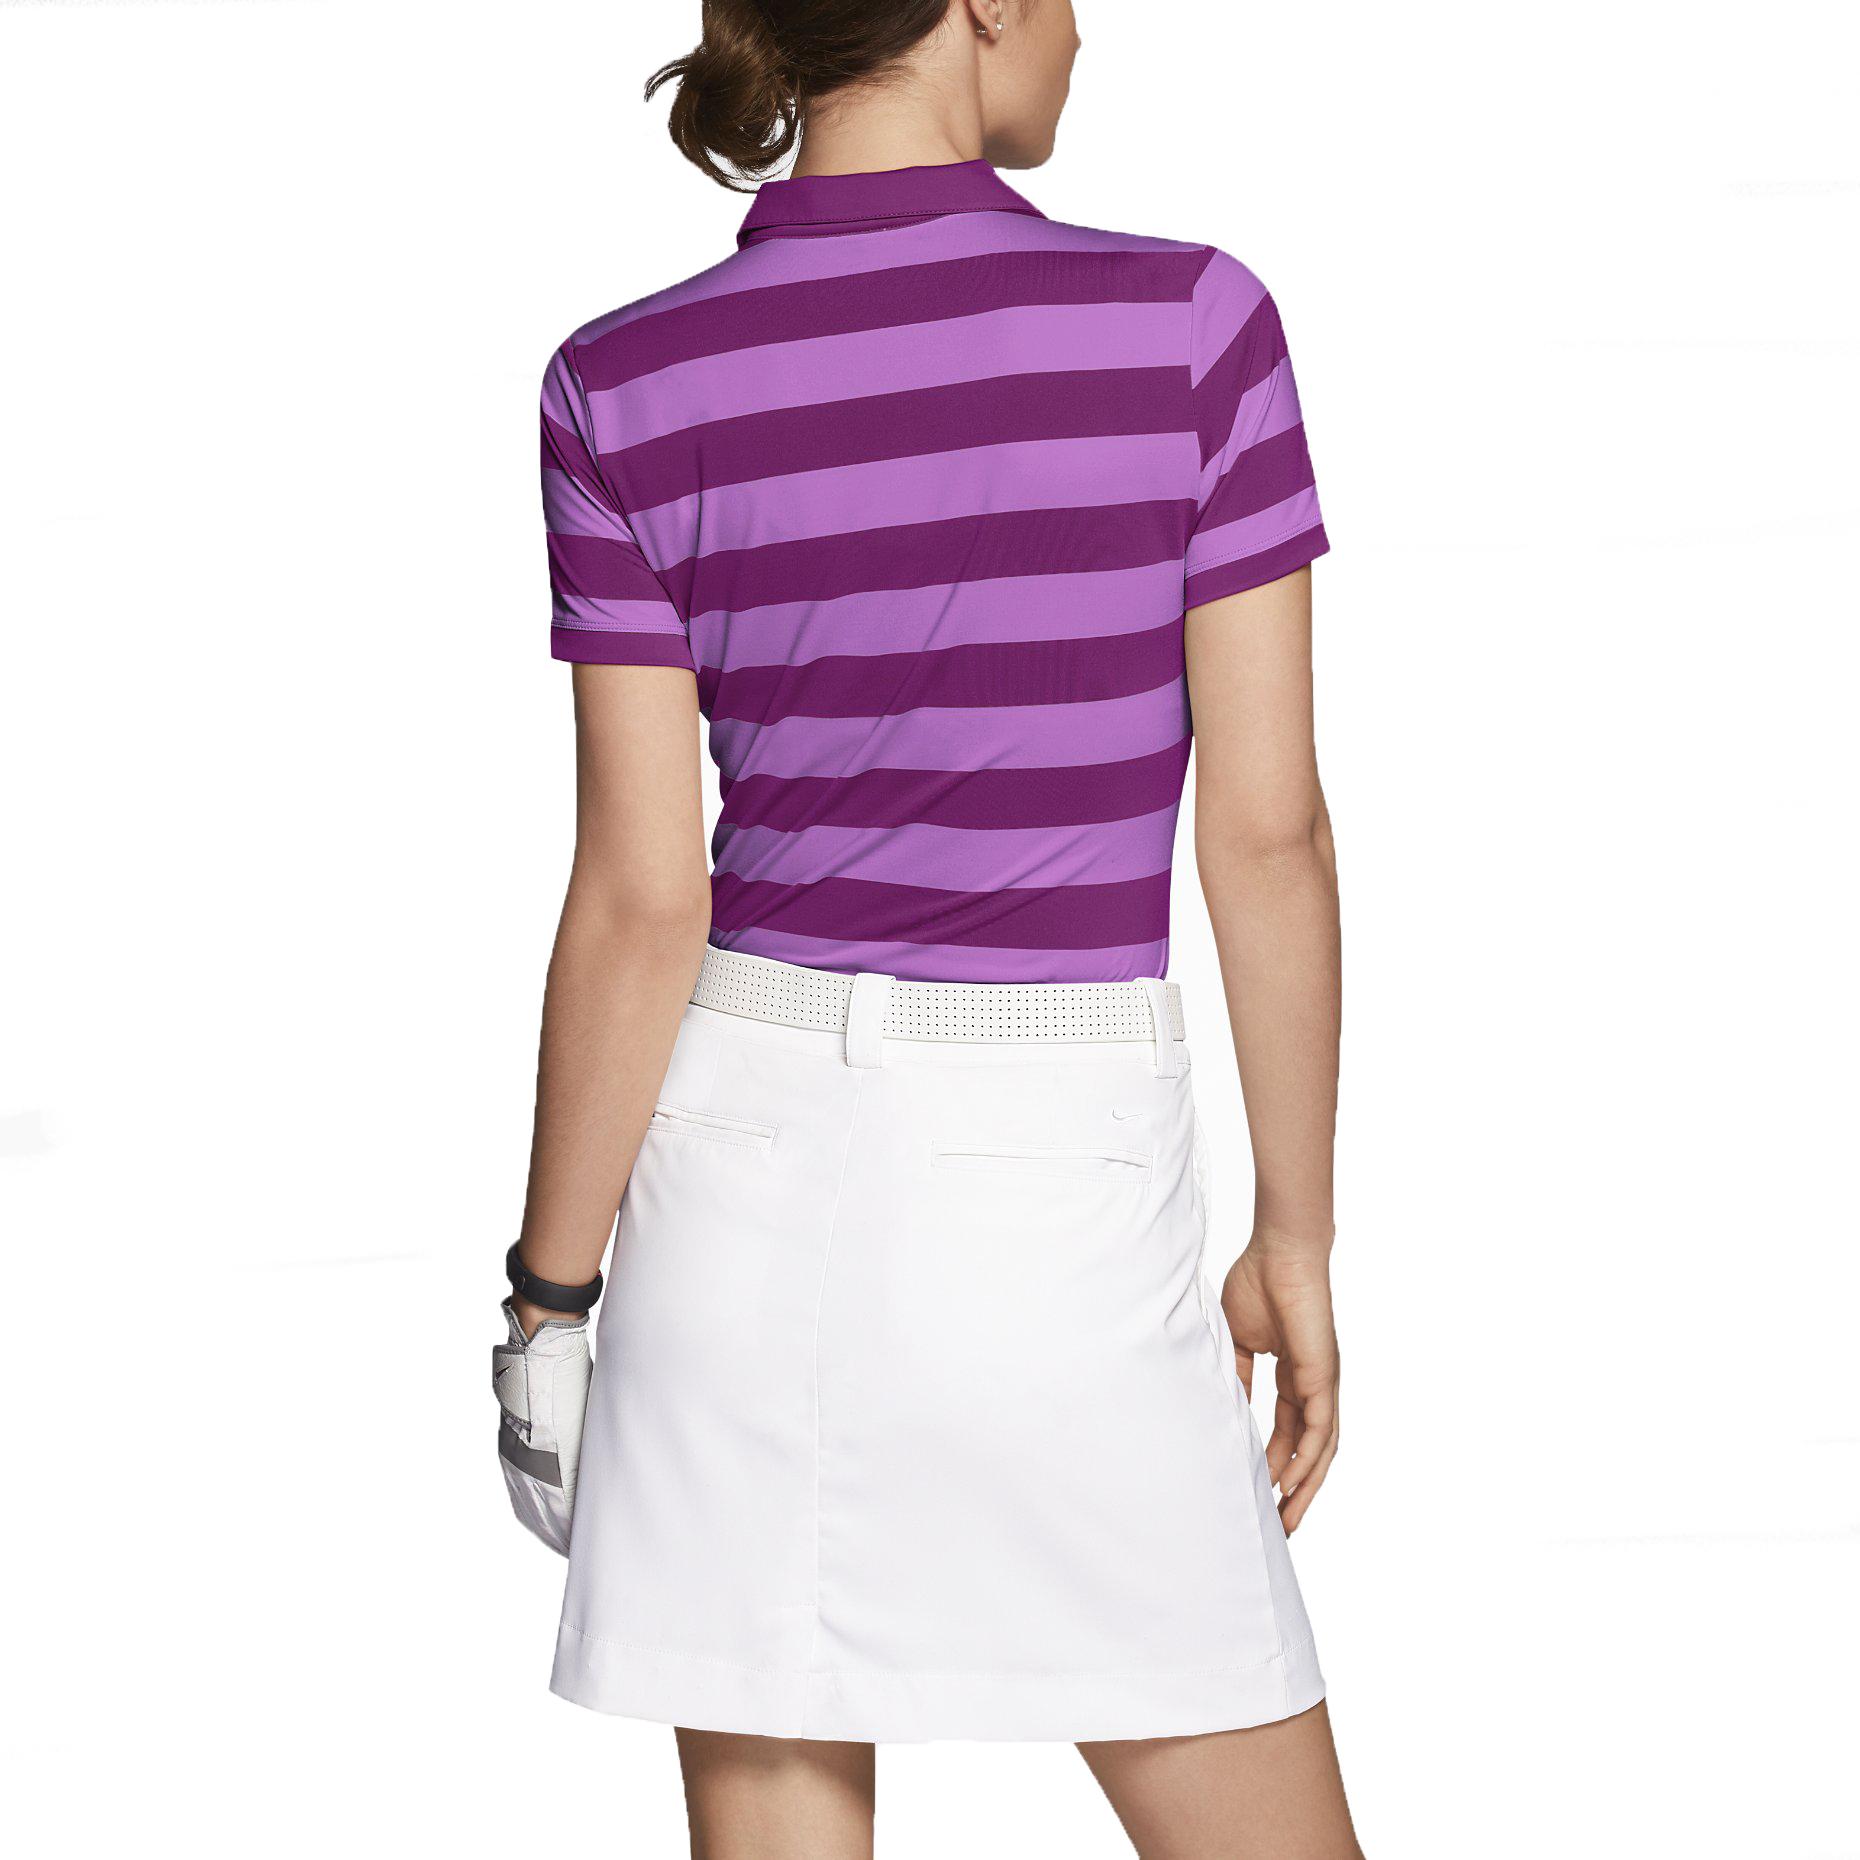 Nike Women's Dri-Fit Bold Stripe Golf Polo Shirt | eBay